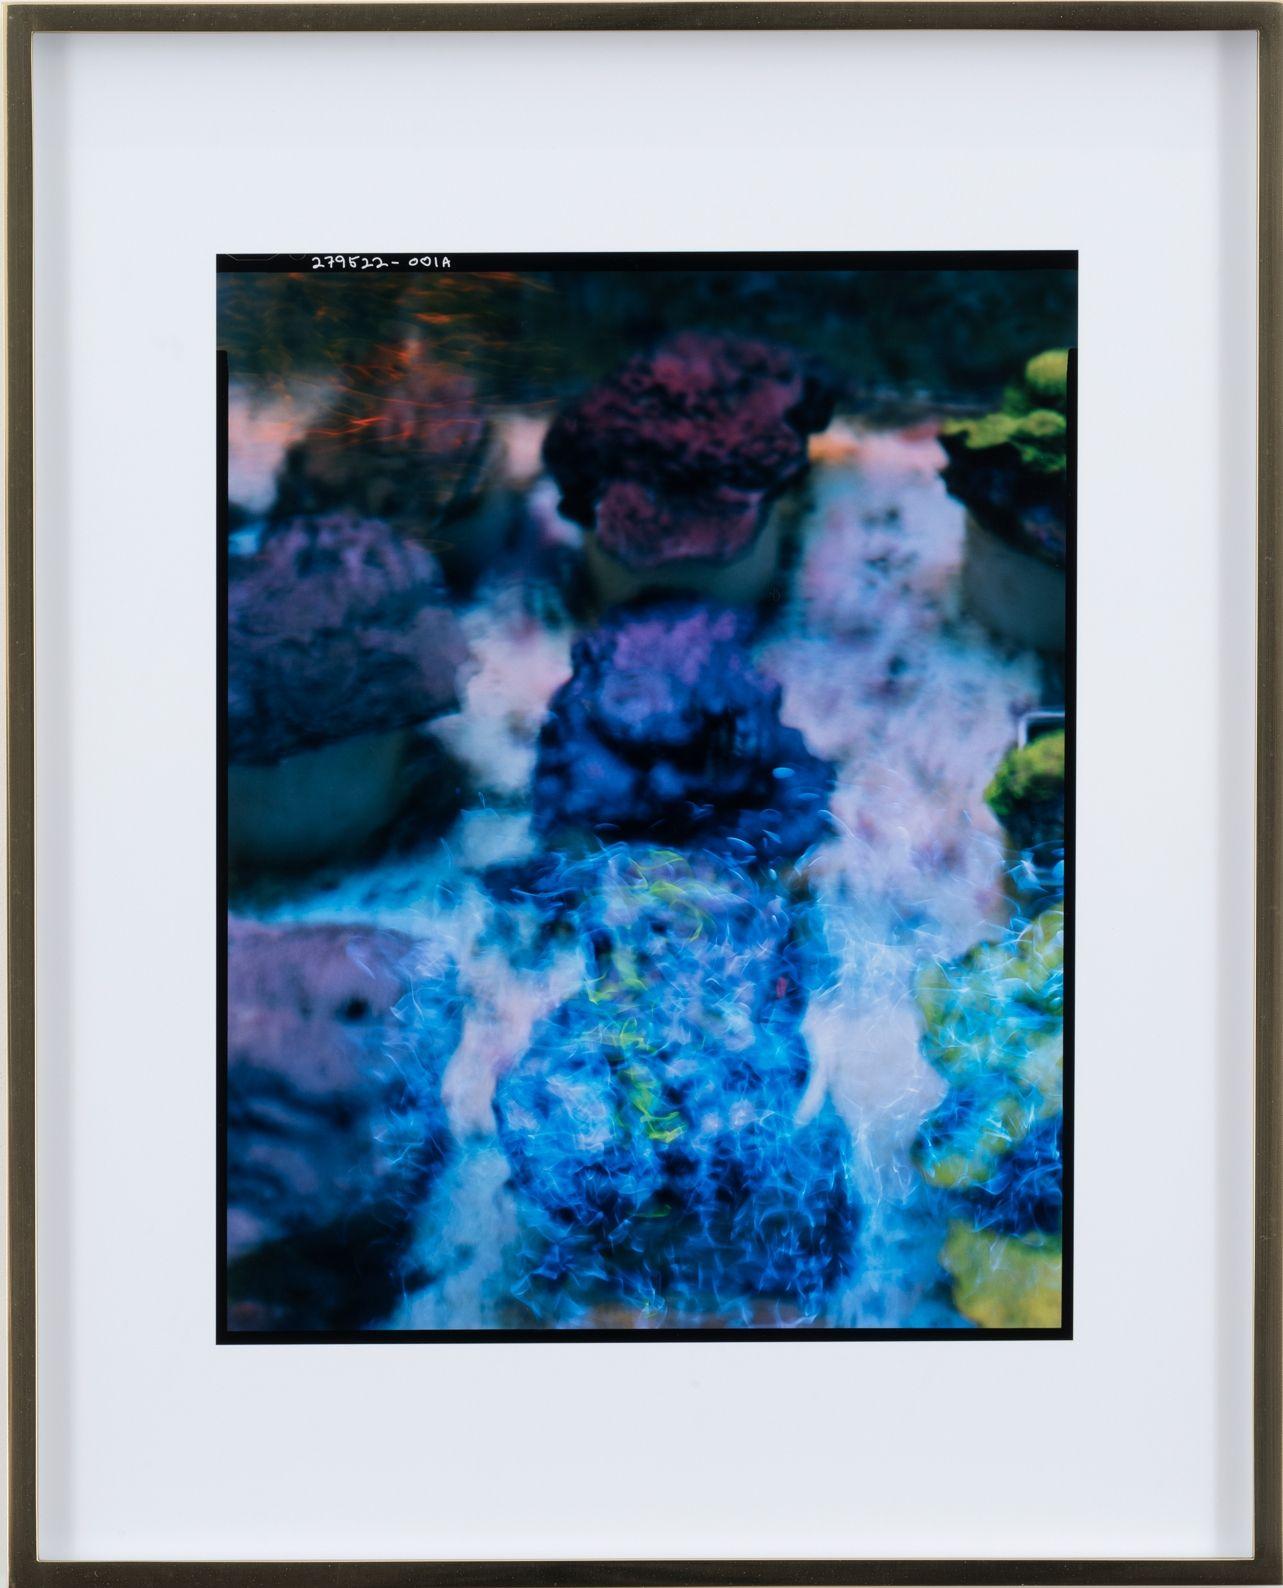 Elad Lassry, Untitled (Corals), 2018